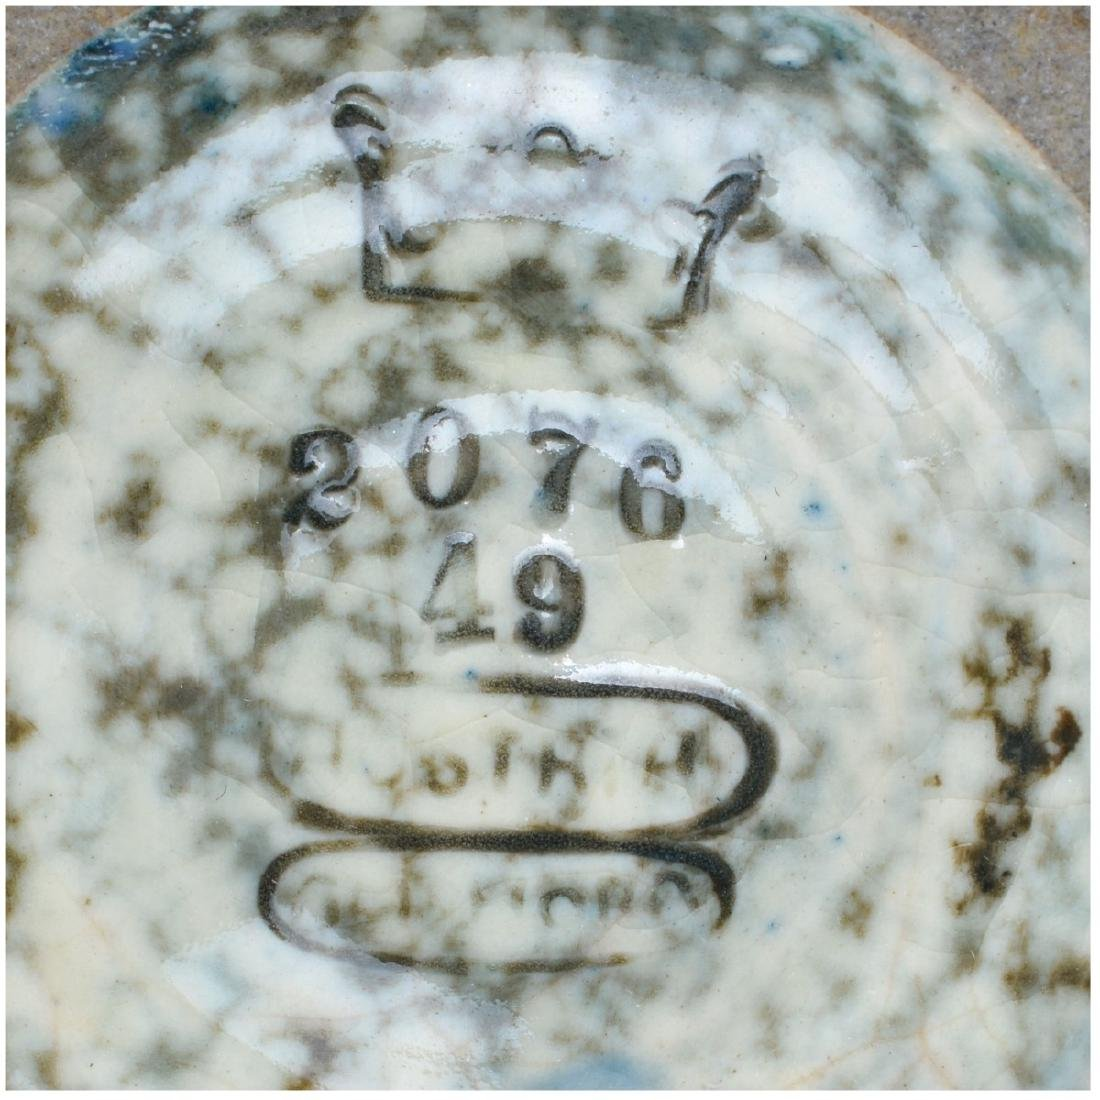 Amphora Austria Gres Bijoux Jeweled Pitcher - 5